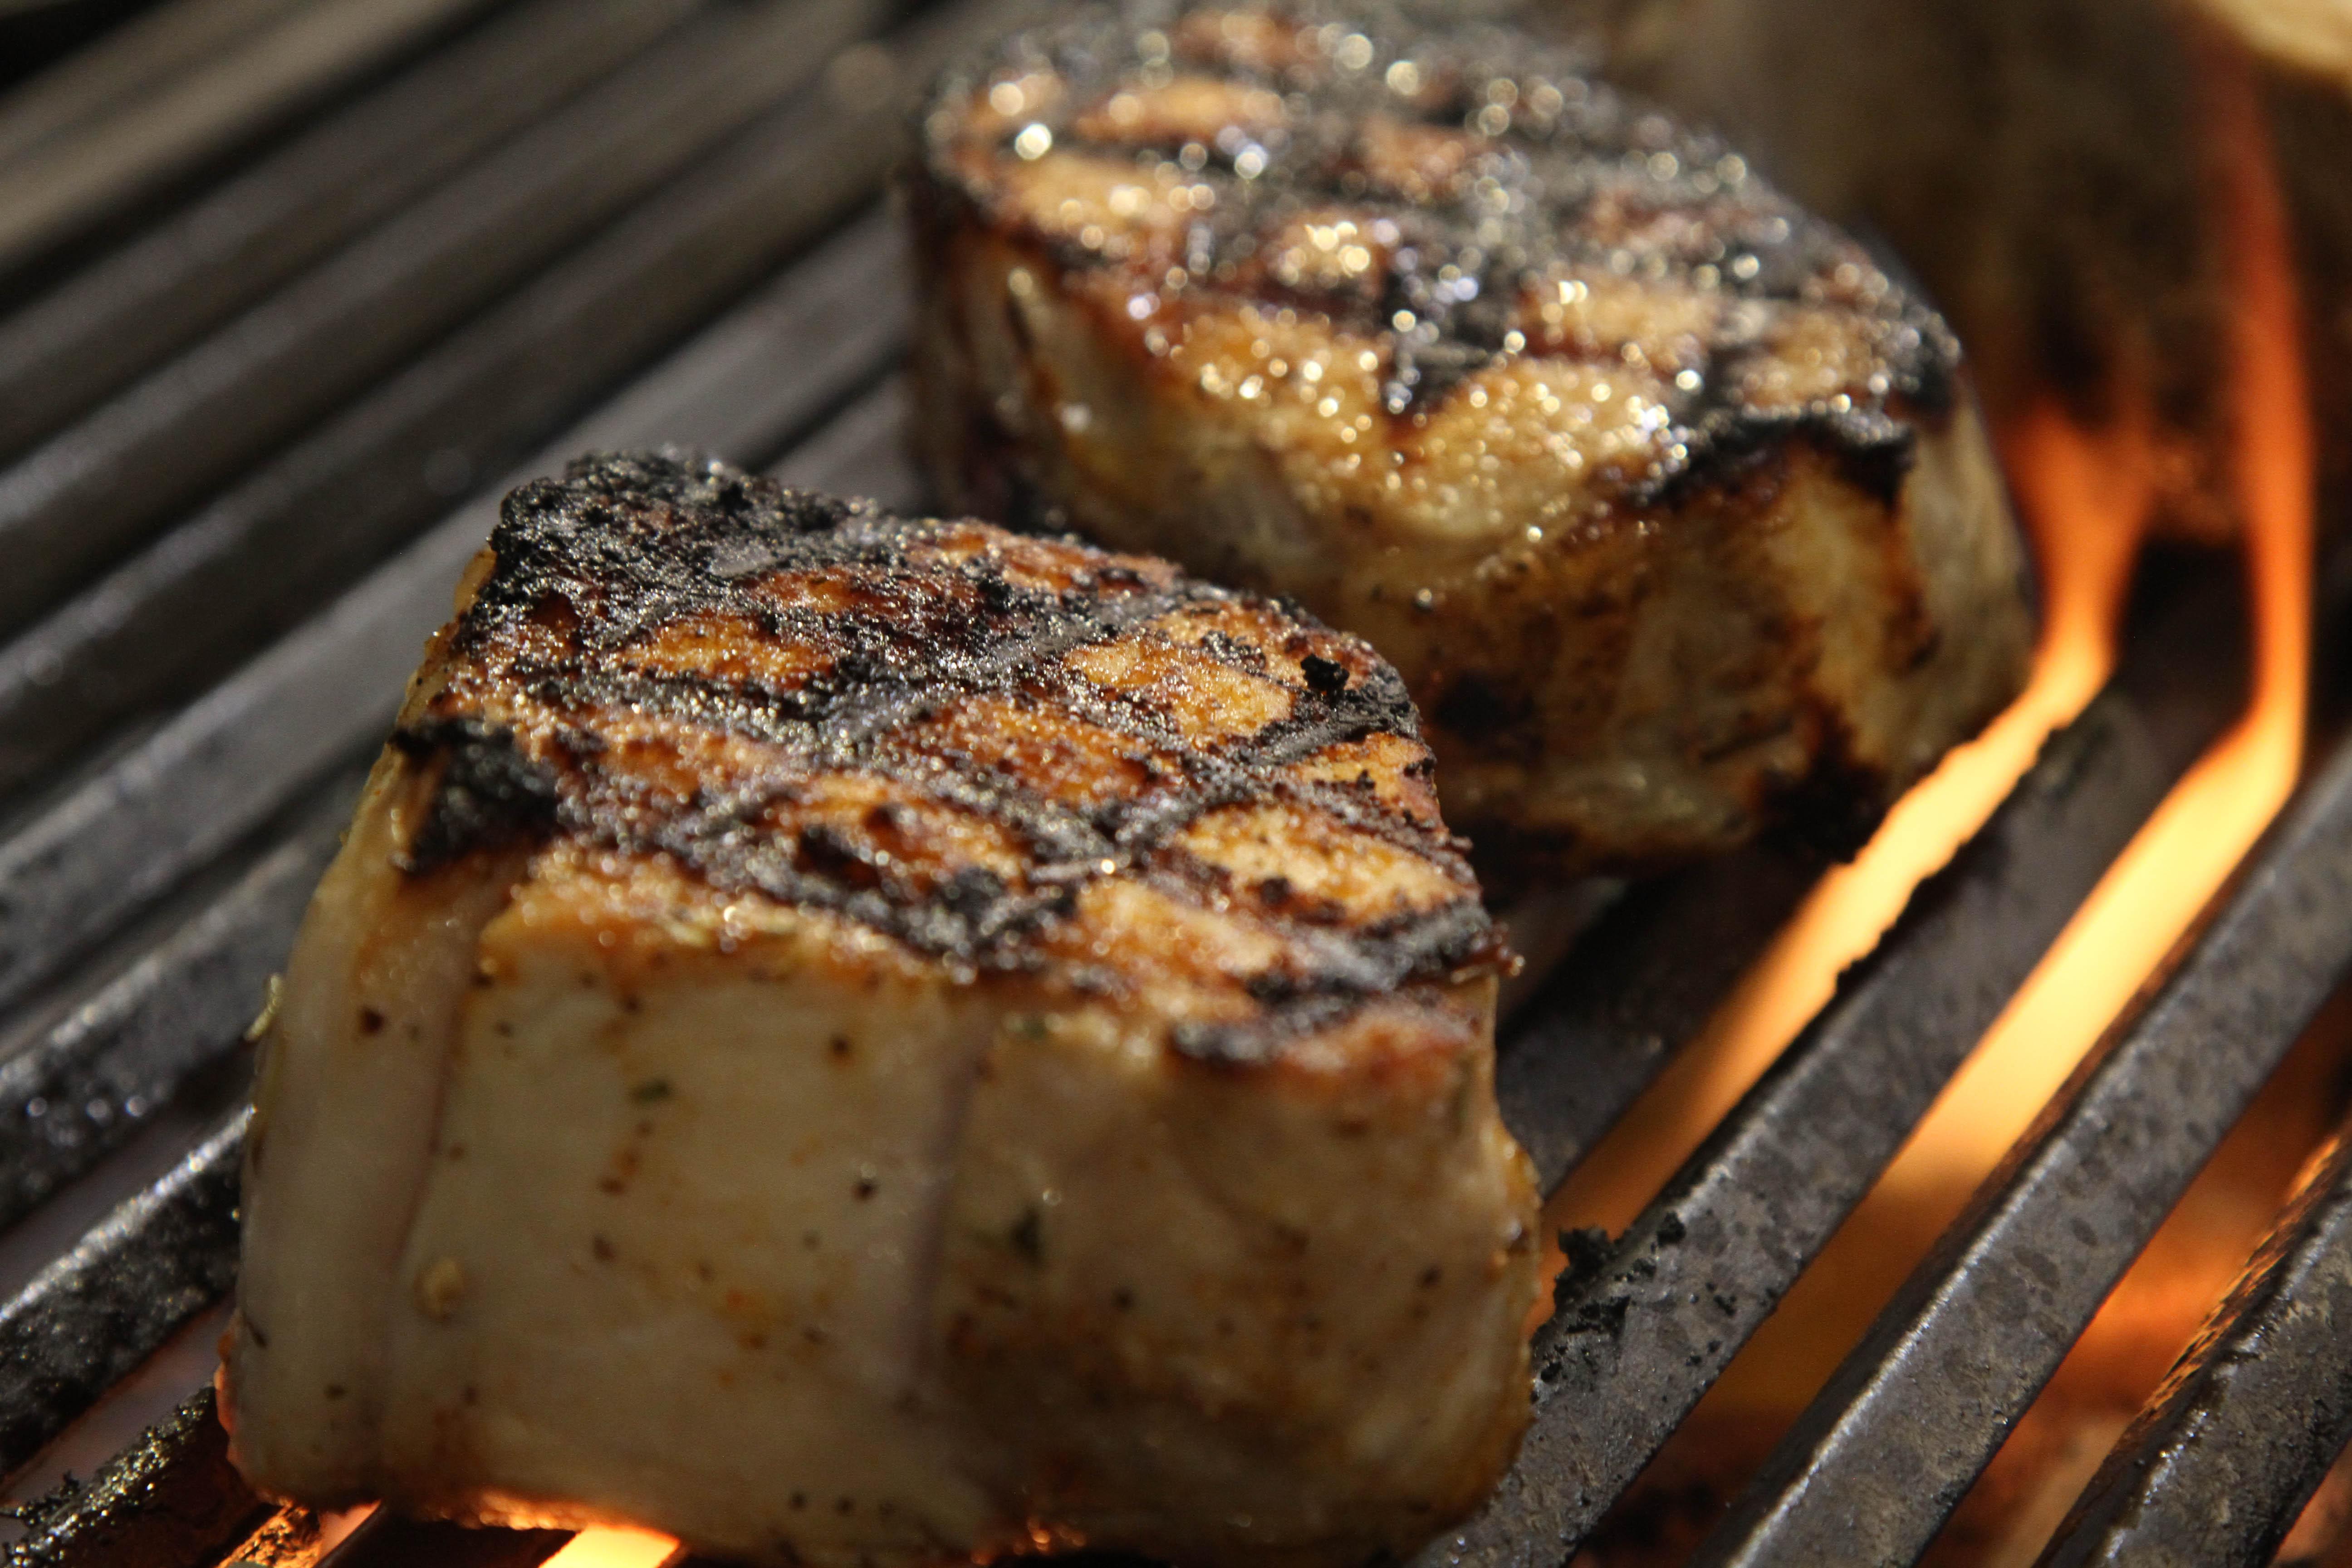 What Temp To Bake Pork Chops  Key Temps Juicy Grilled Pork Chops